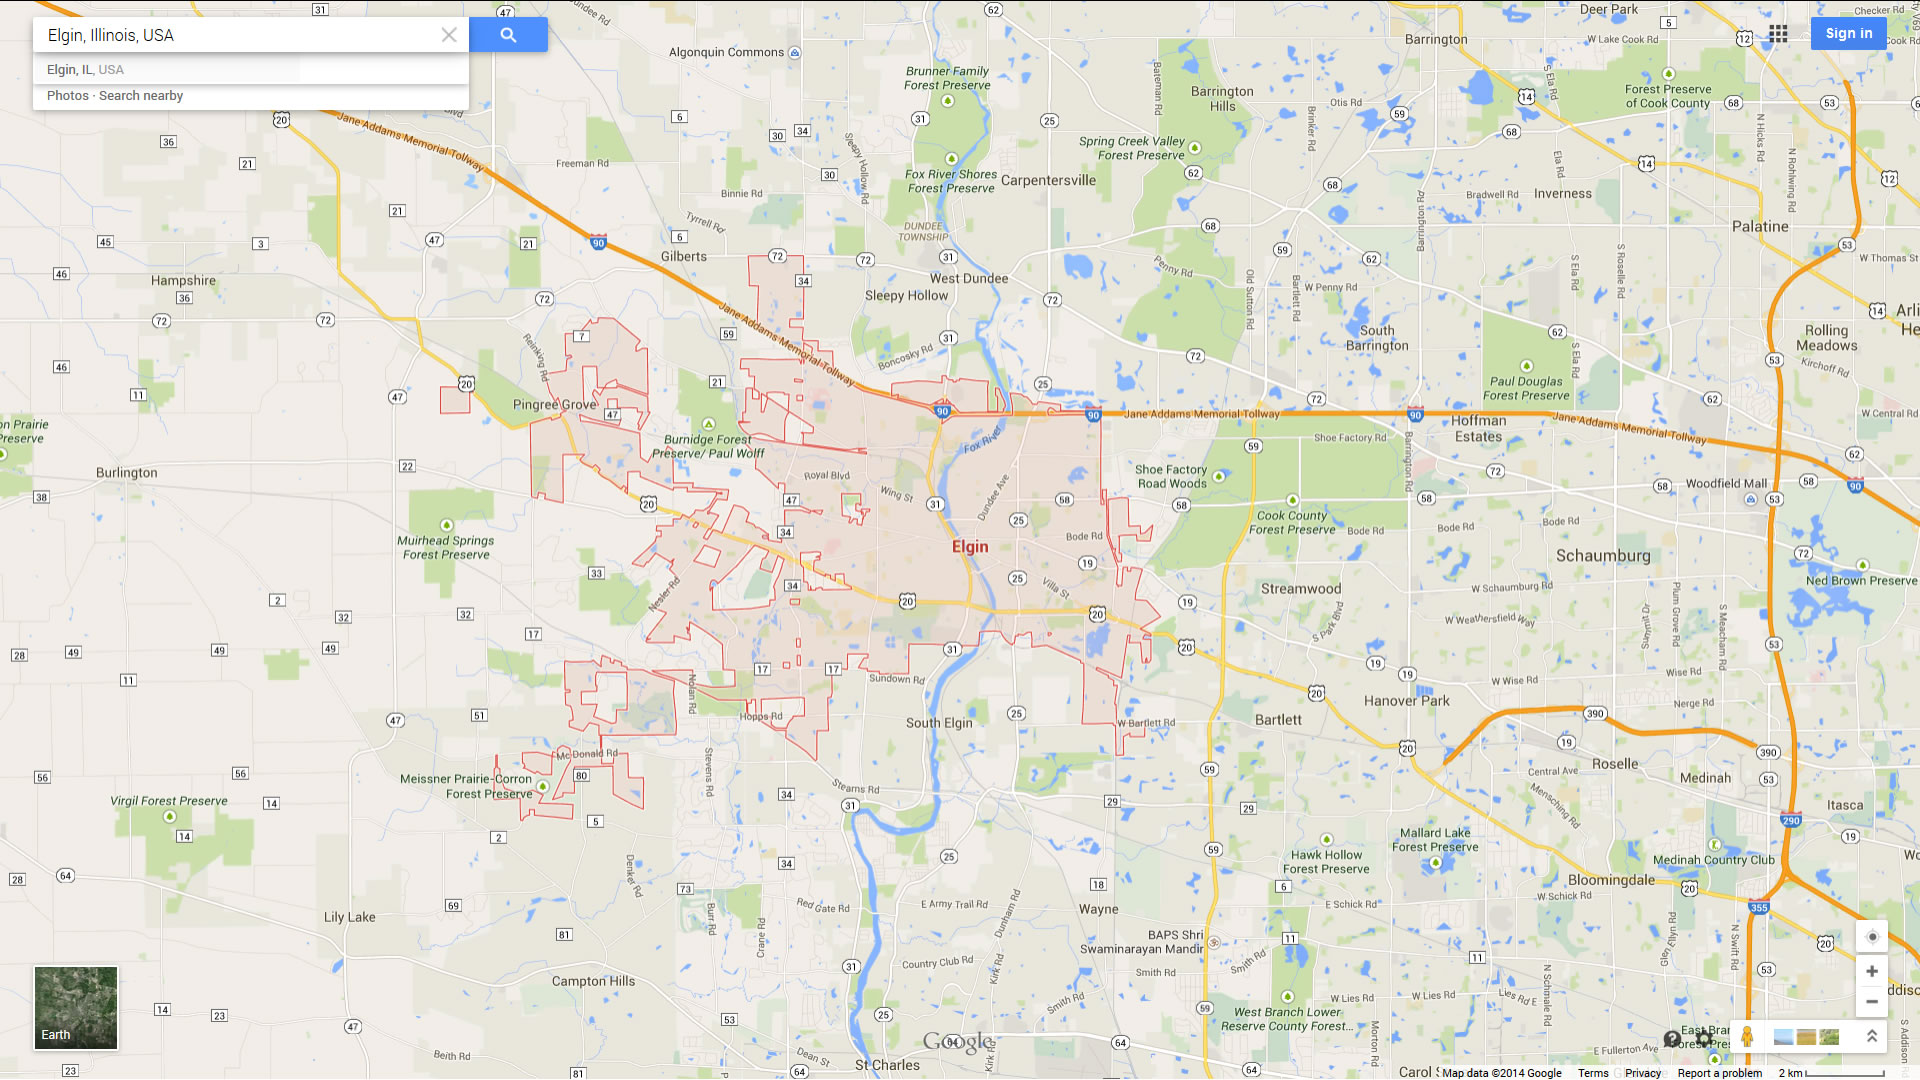 elgin illinois map